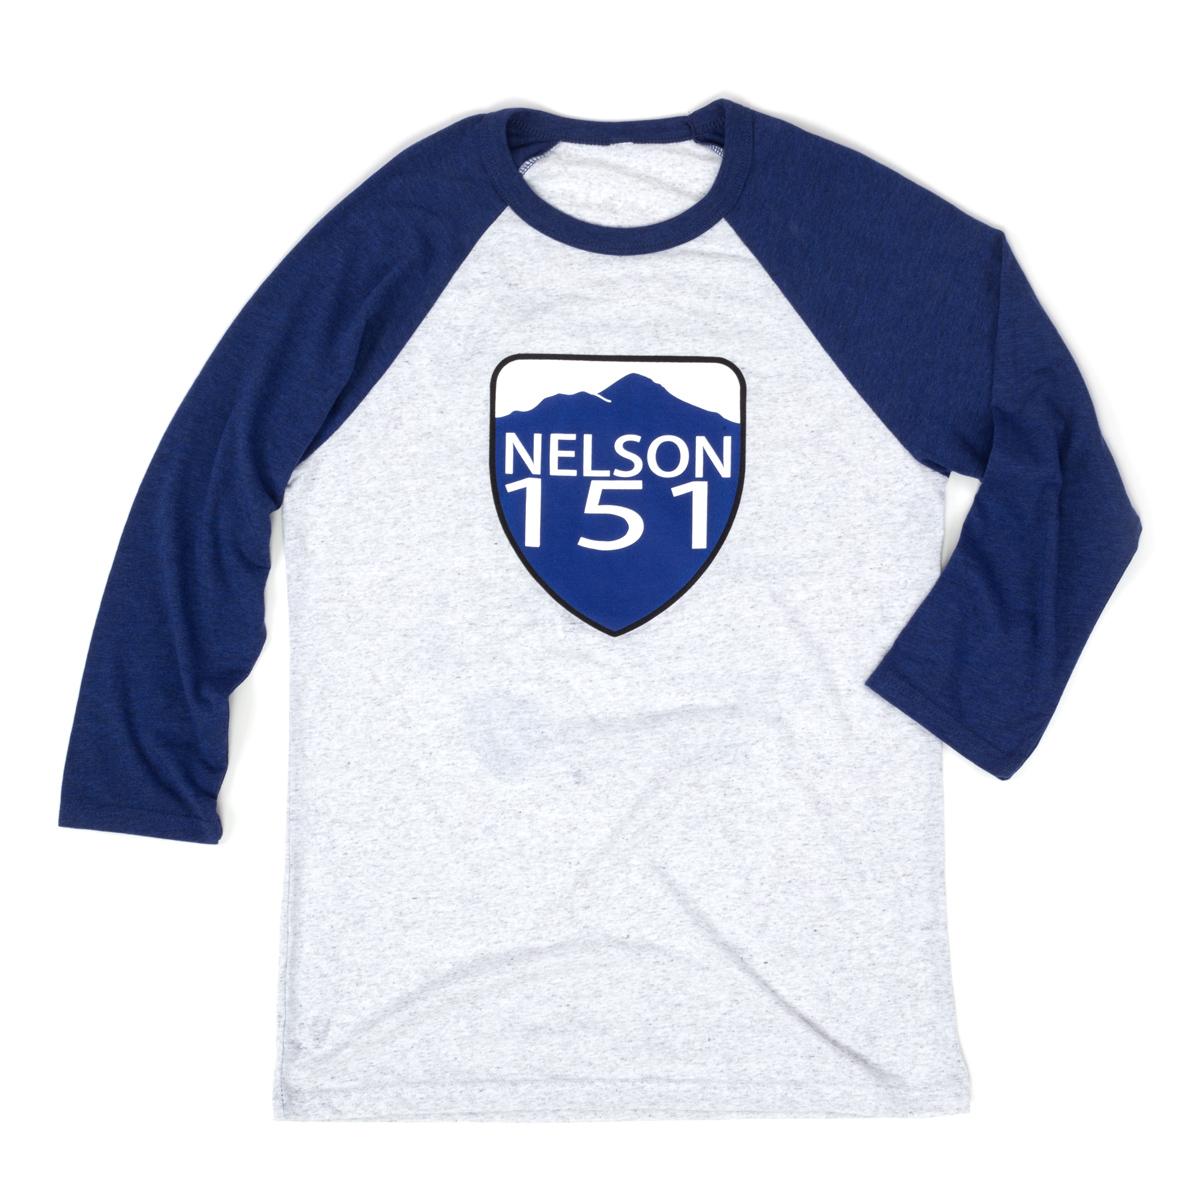 Nelson 151 3/4 Sleeve Baseball Tee